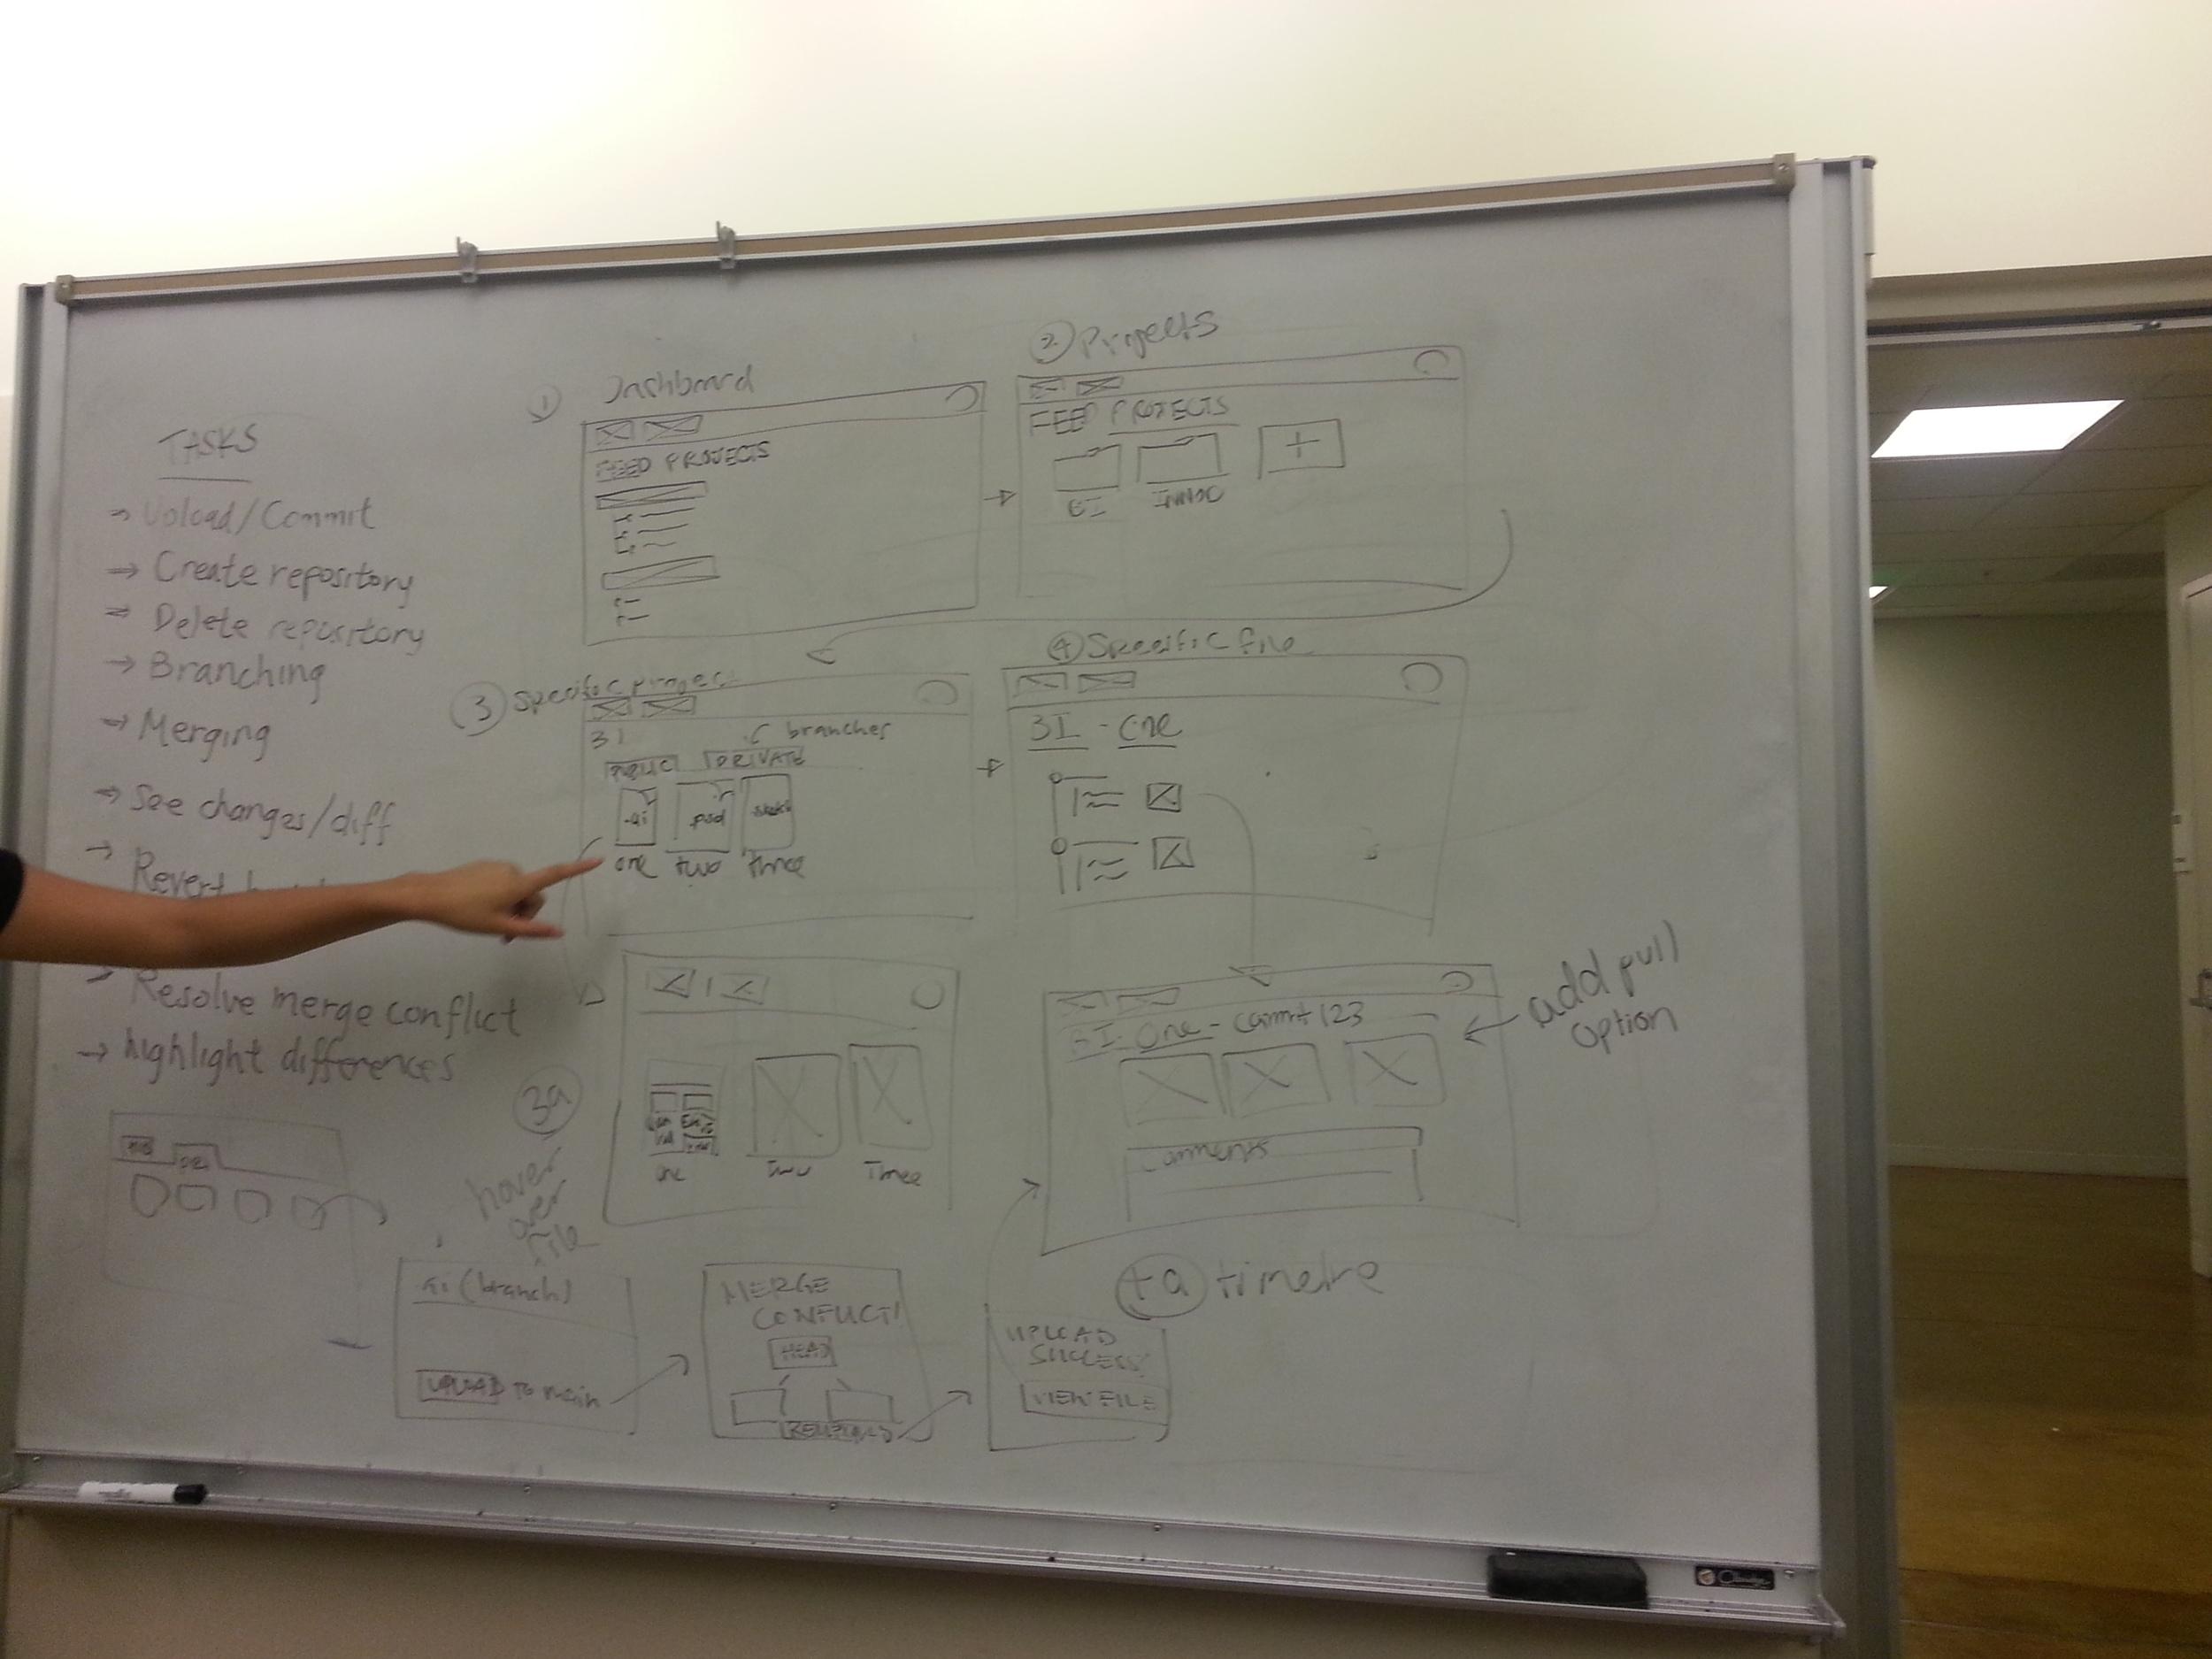 Brainstorm 3.jpg